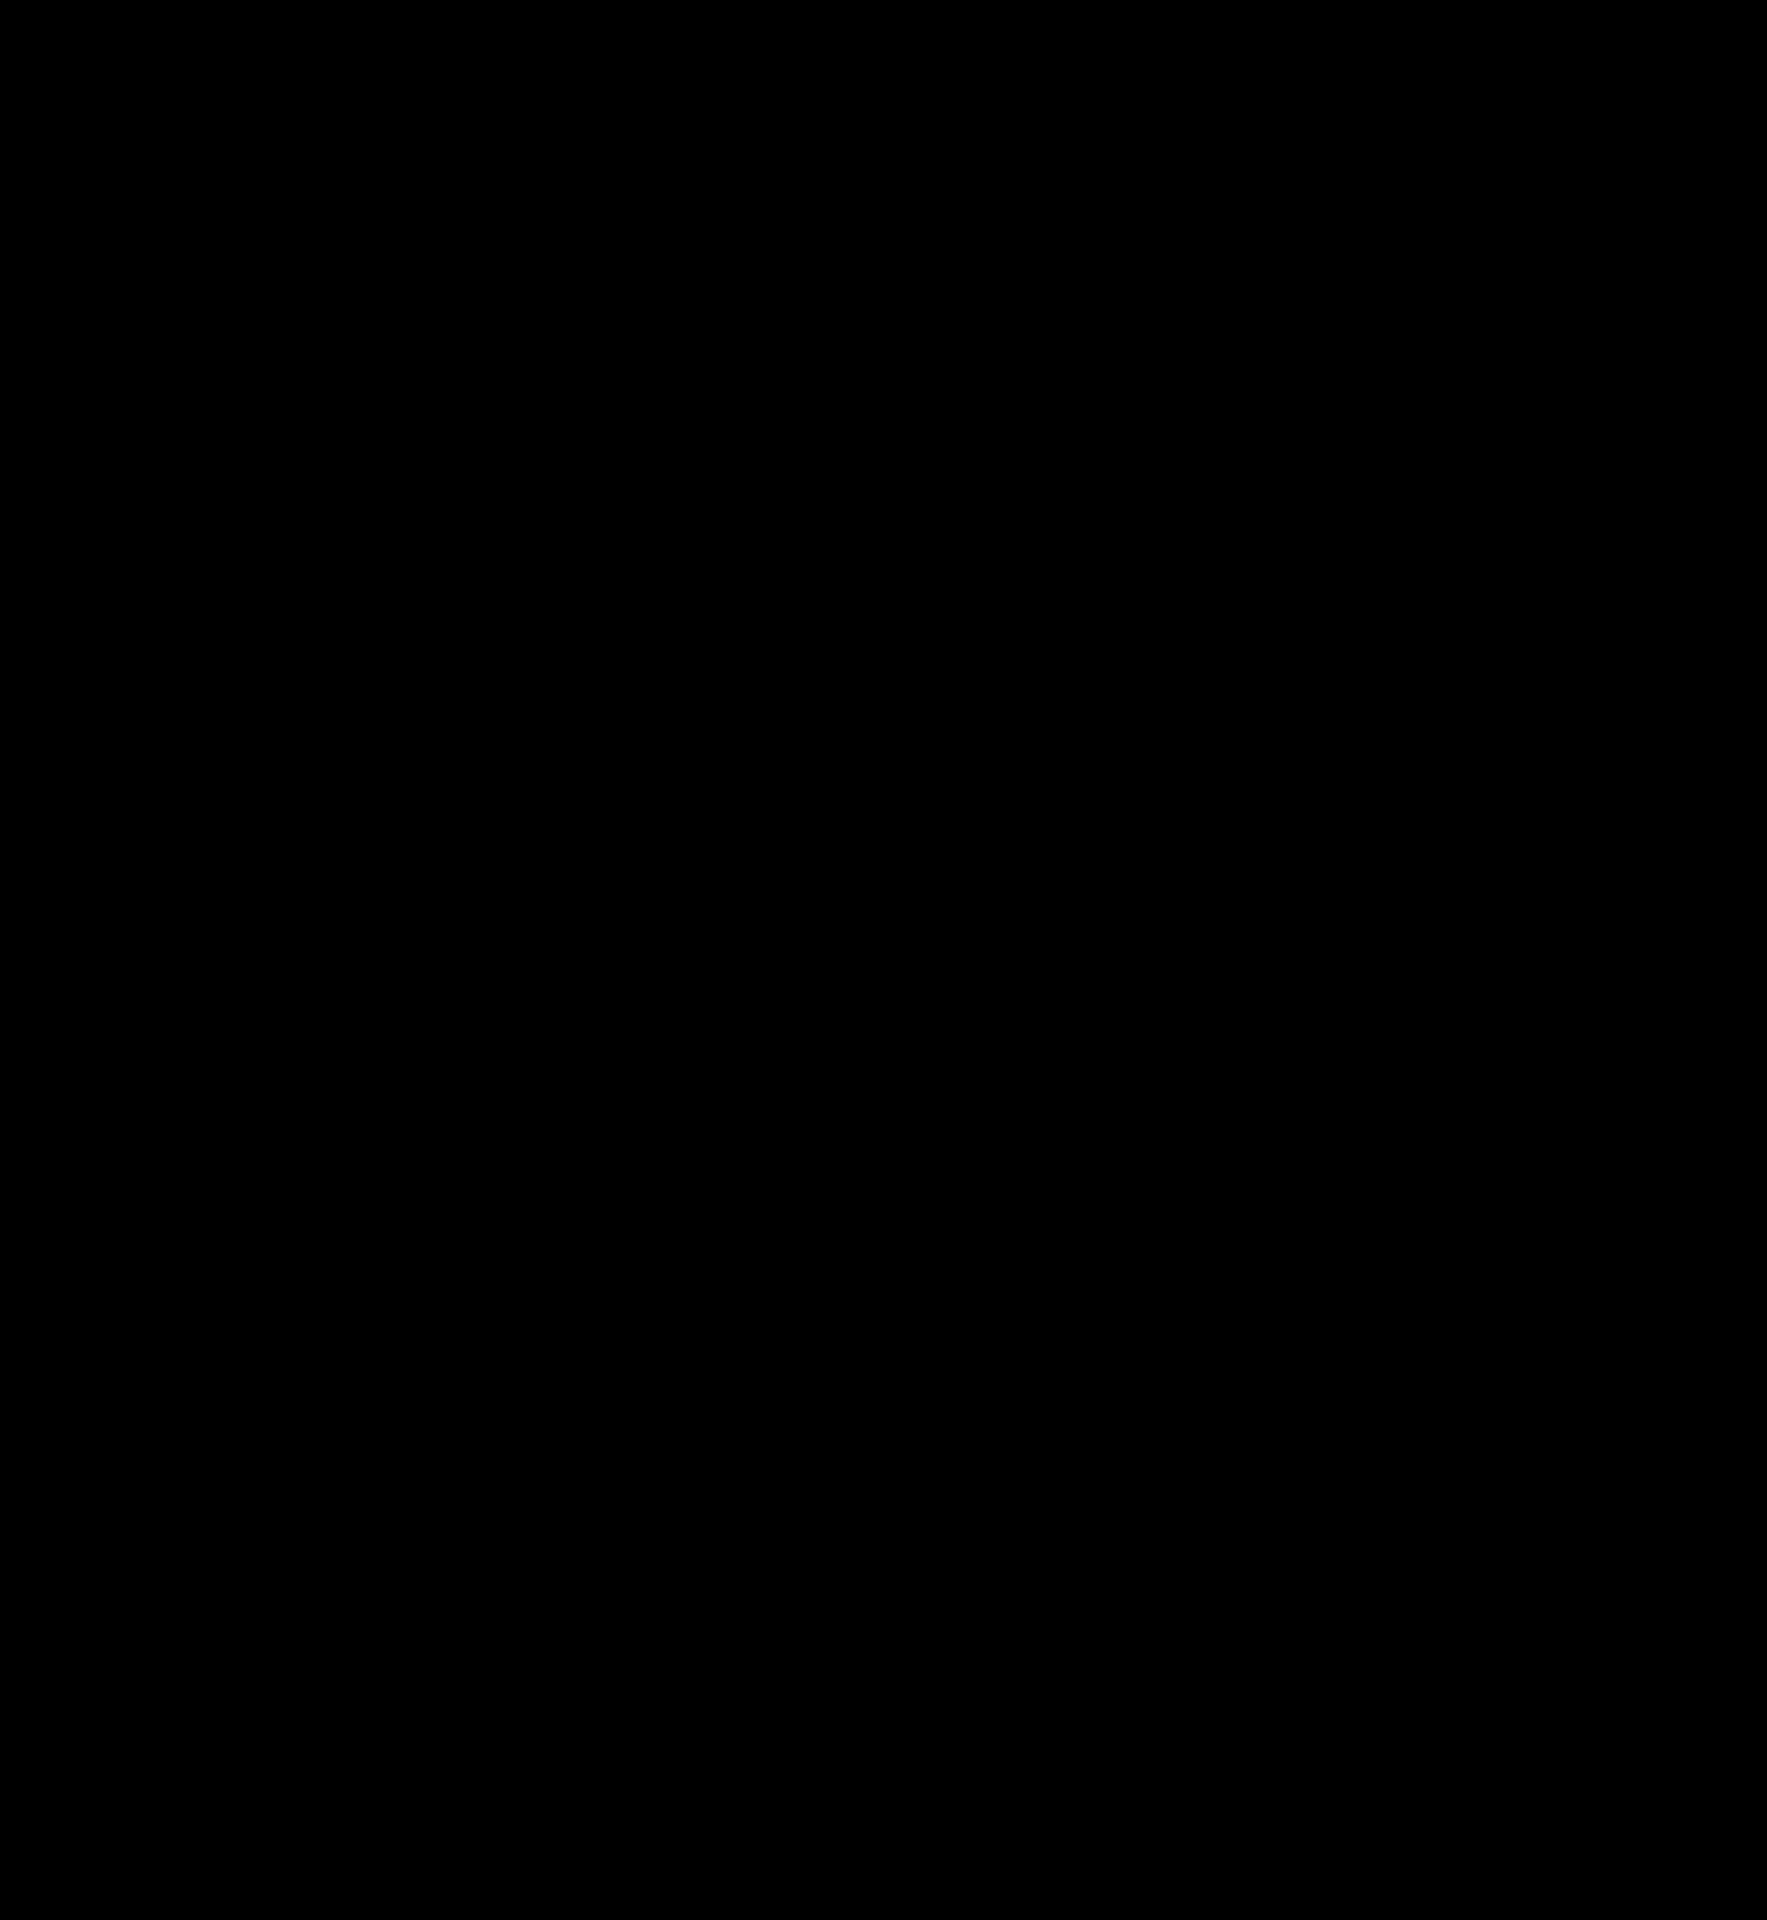 silhouette-3578066